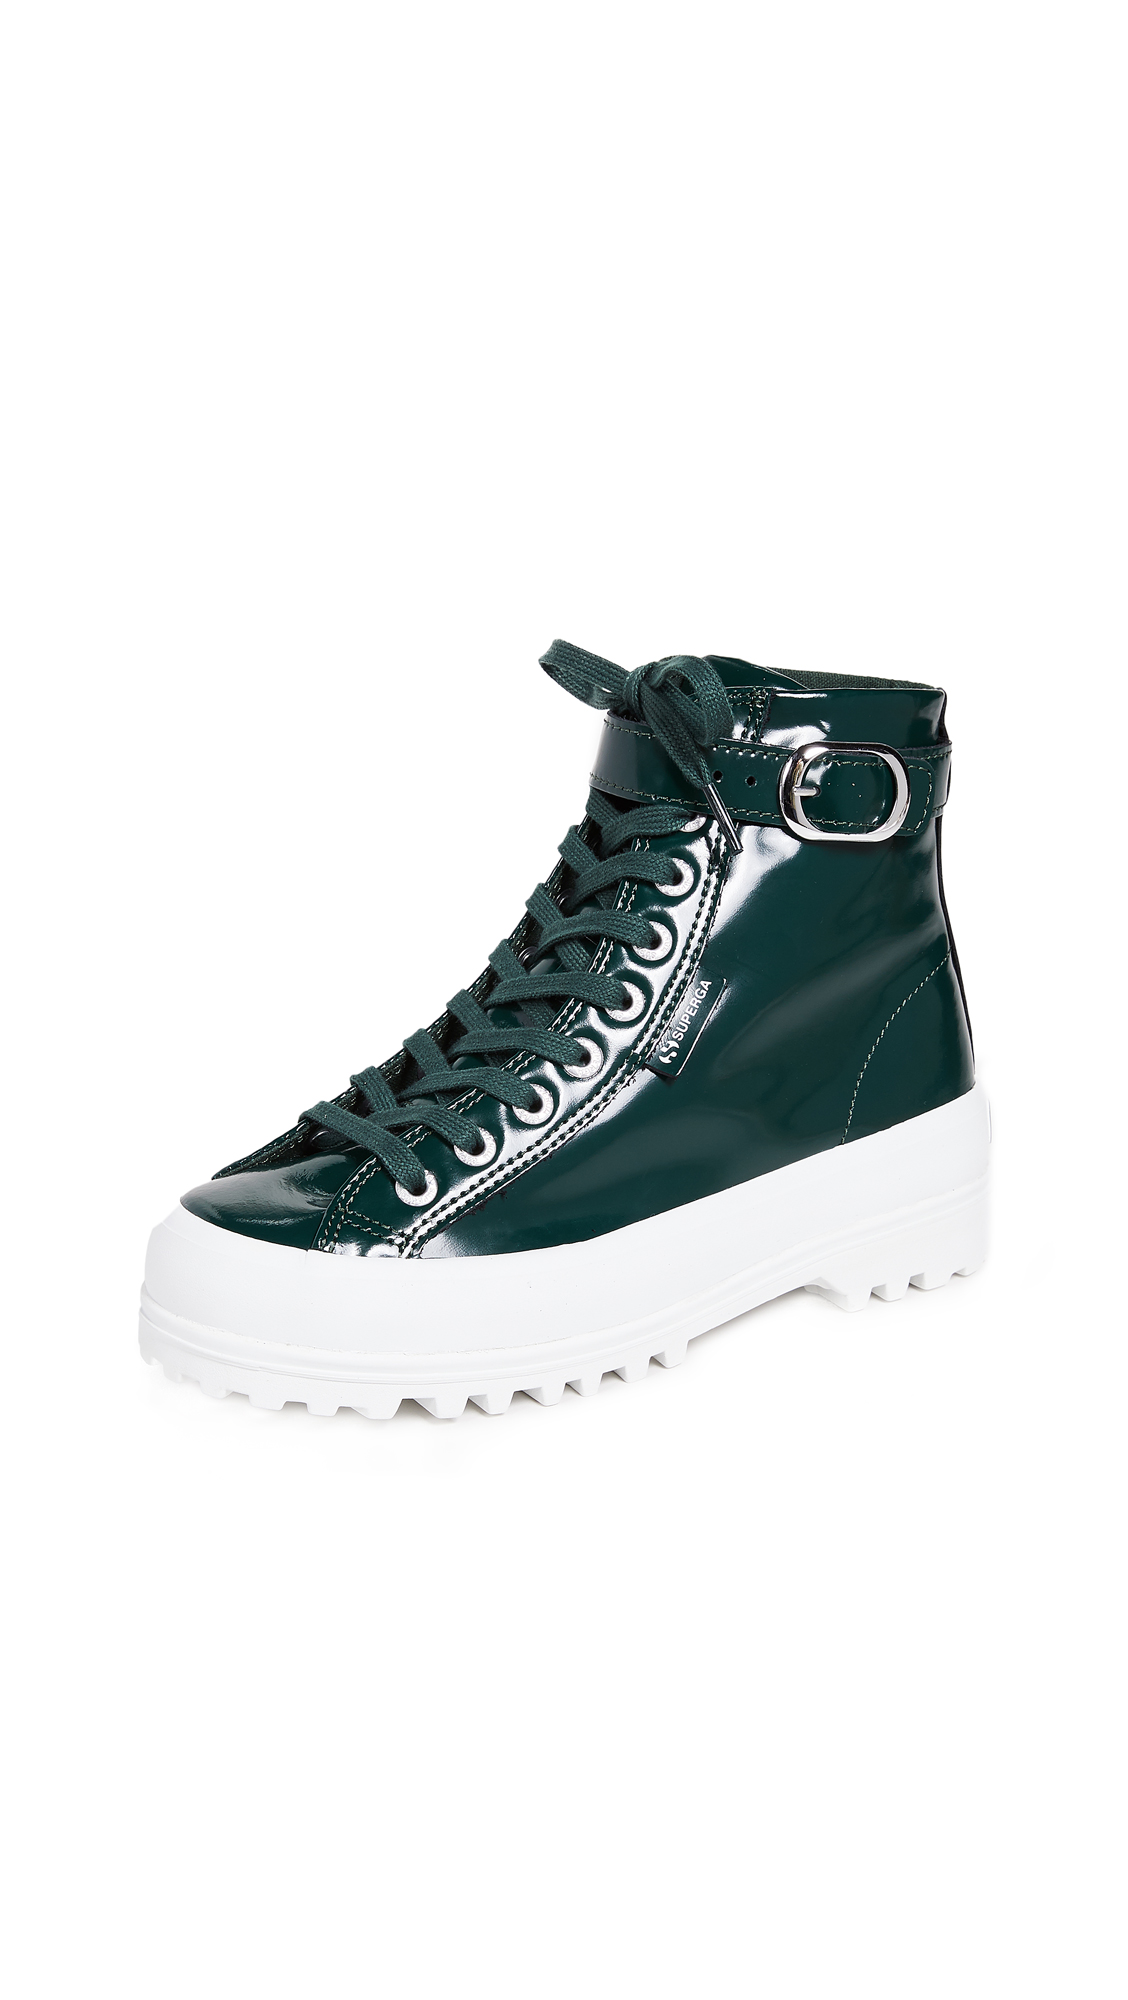 Superga x Alexa Chung 2244 Combat Boot Sneakers